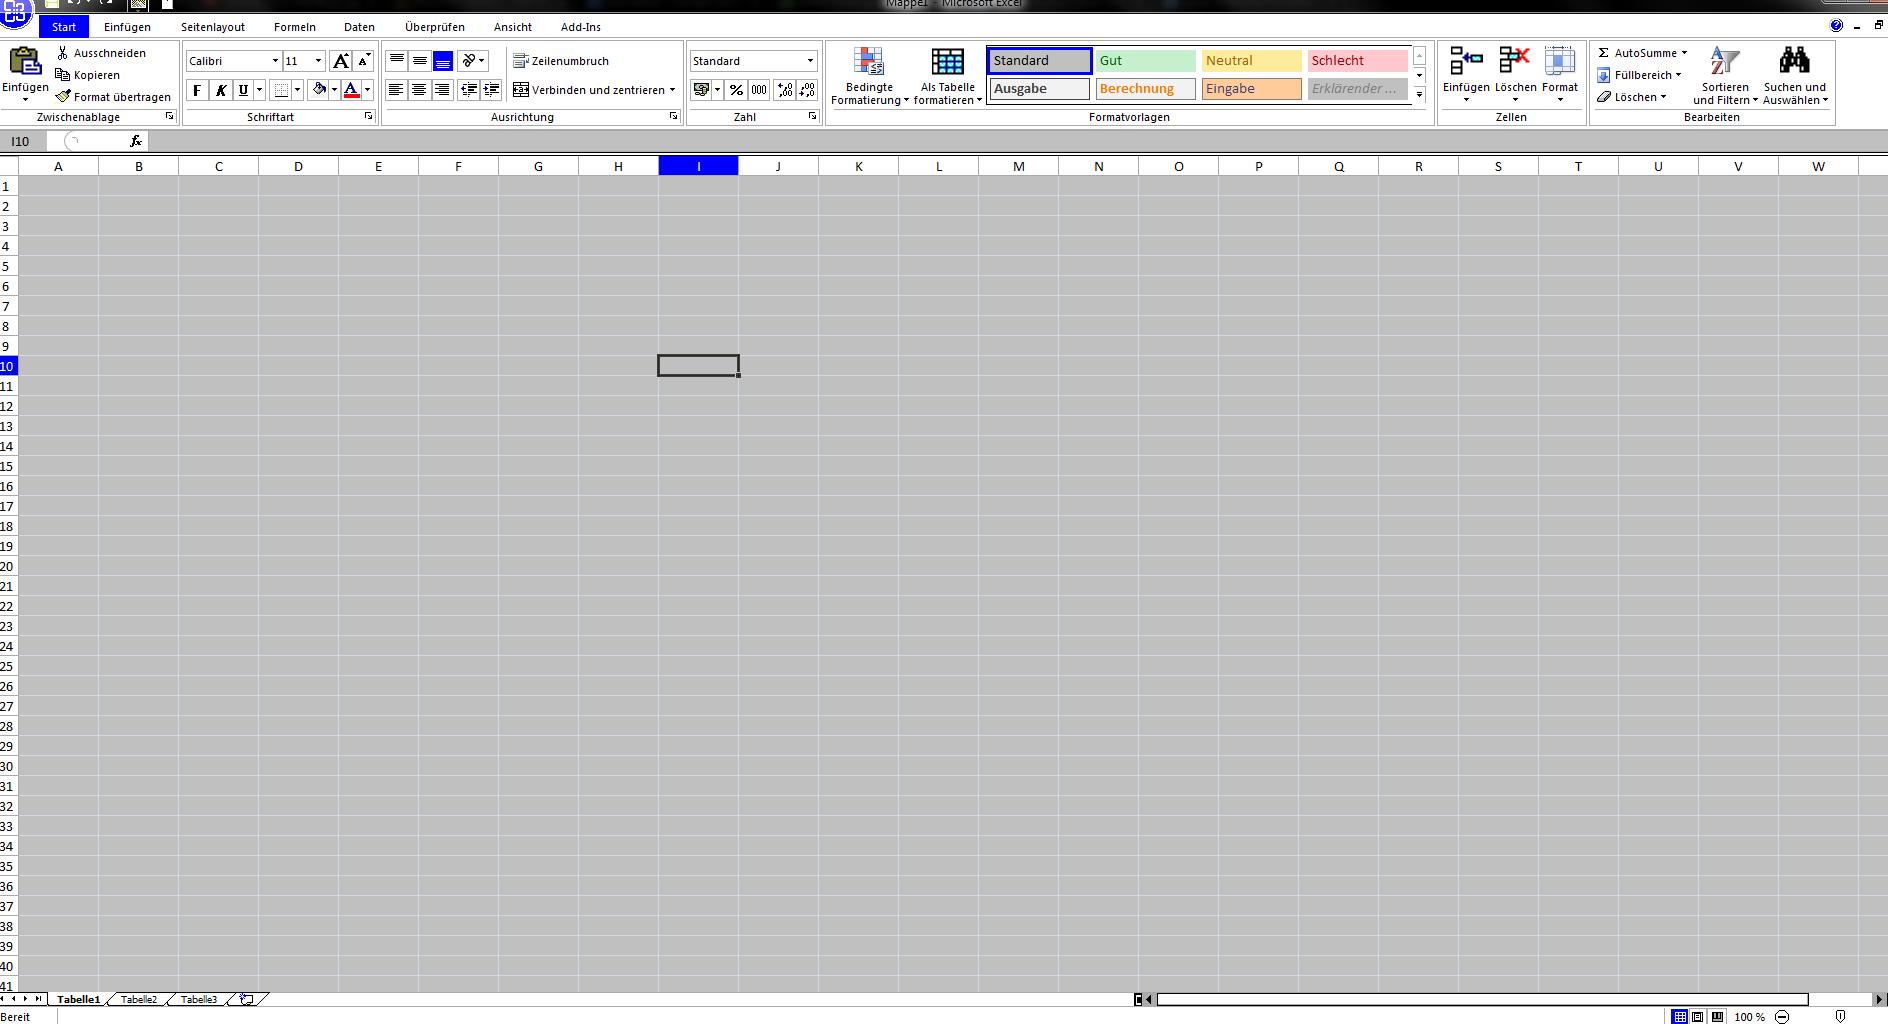 Microsoft Excel alle Zellen grau hinterlegt